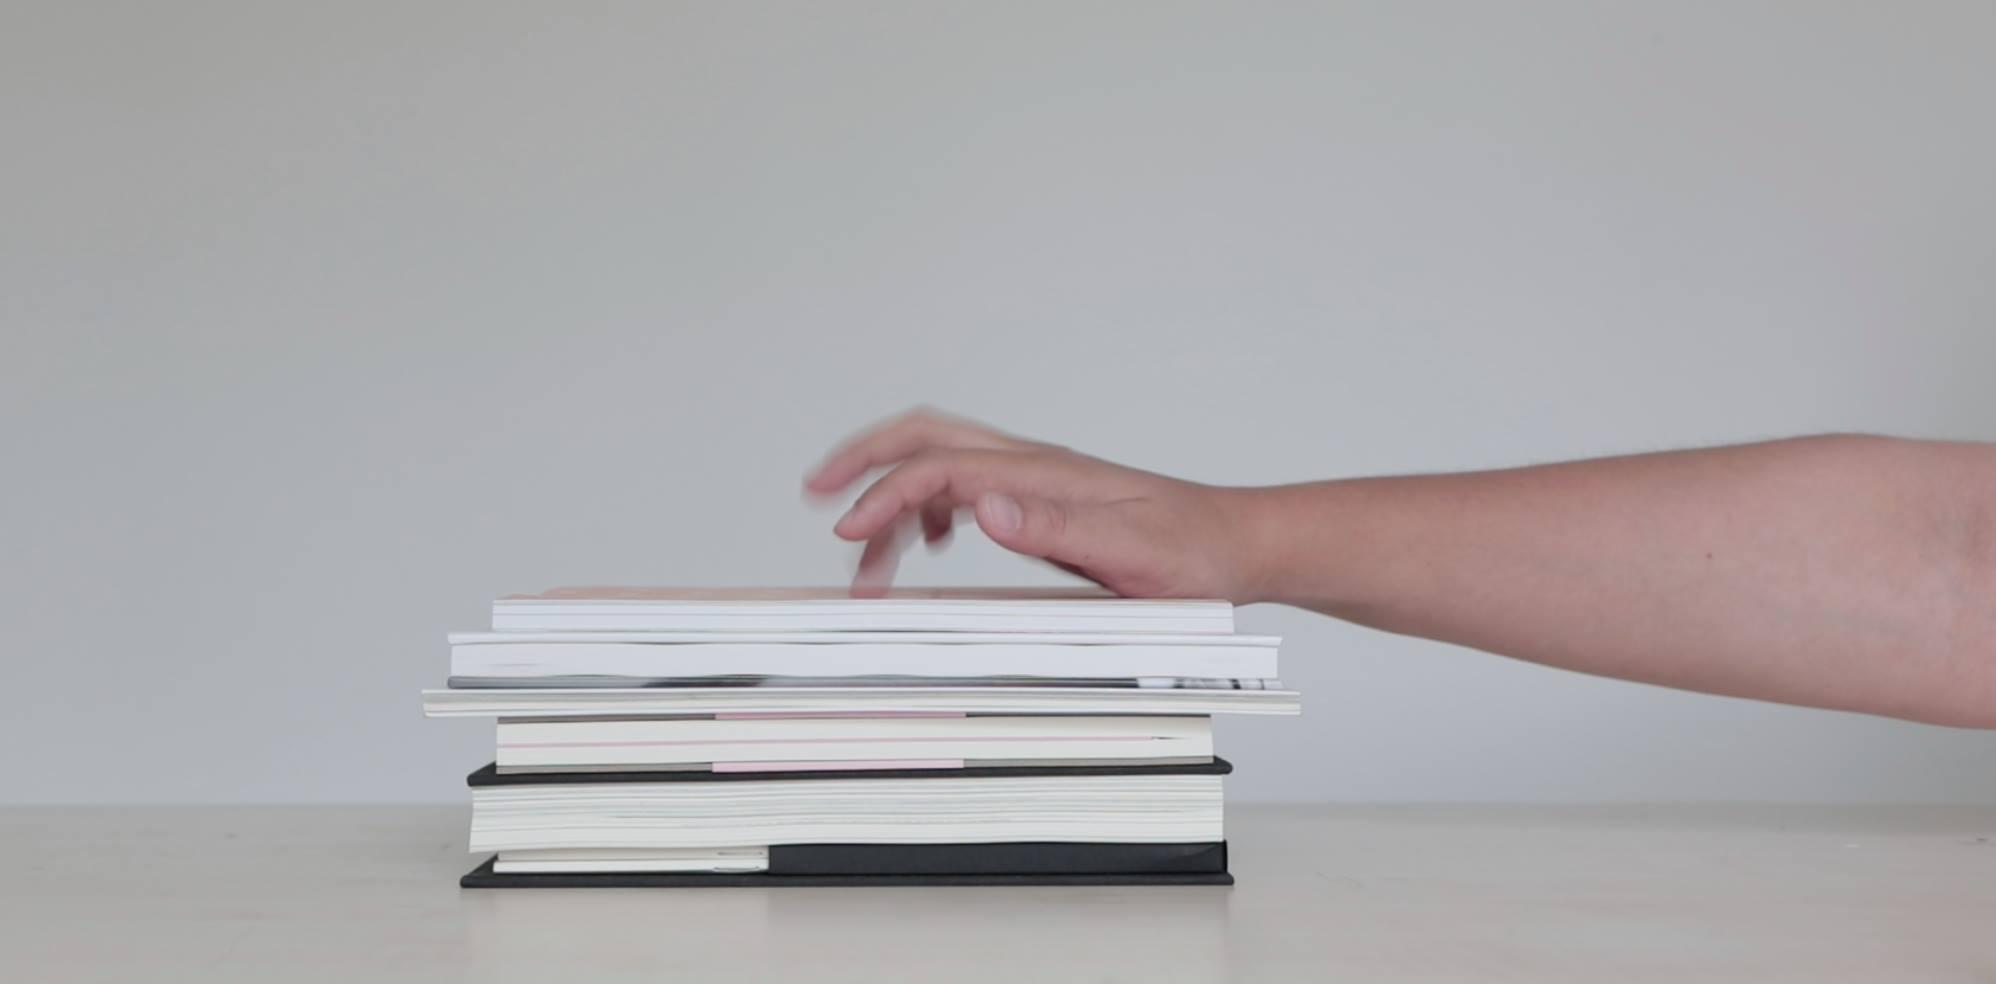 Book Grasp